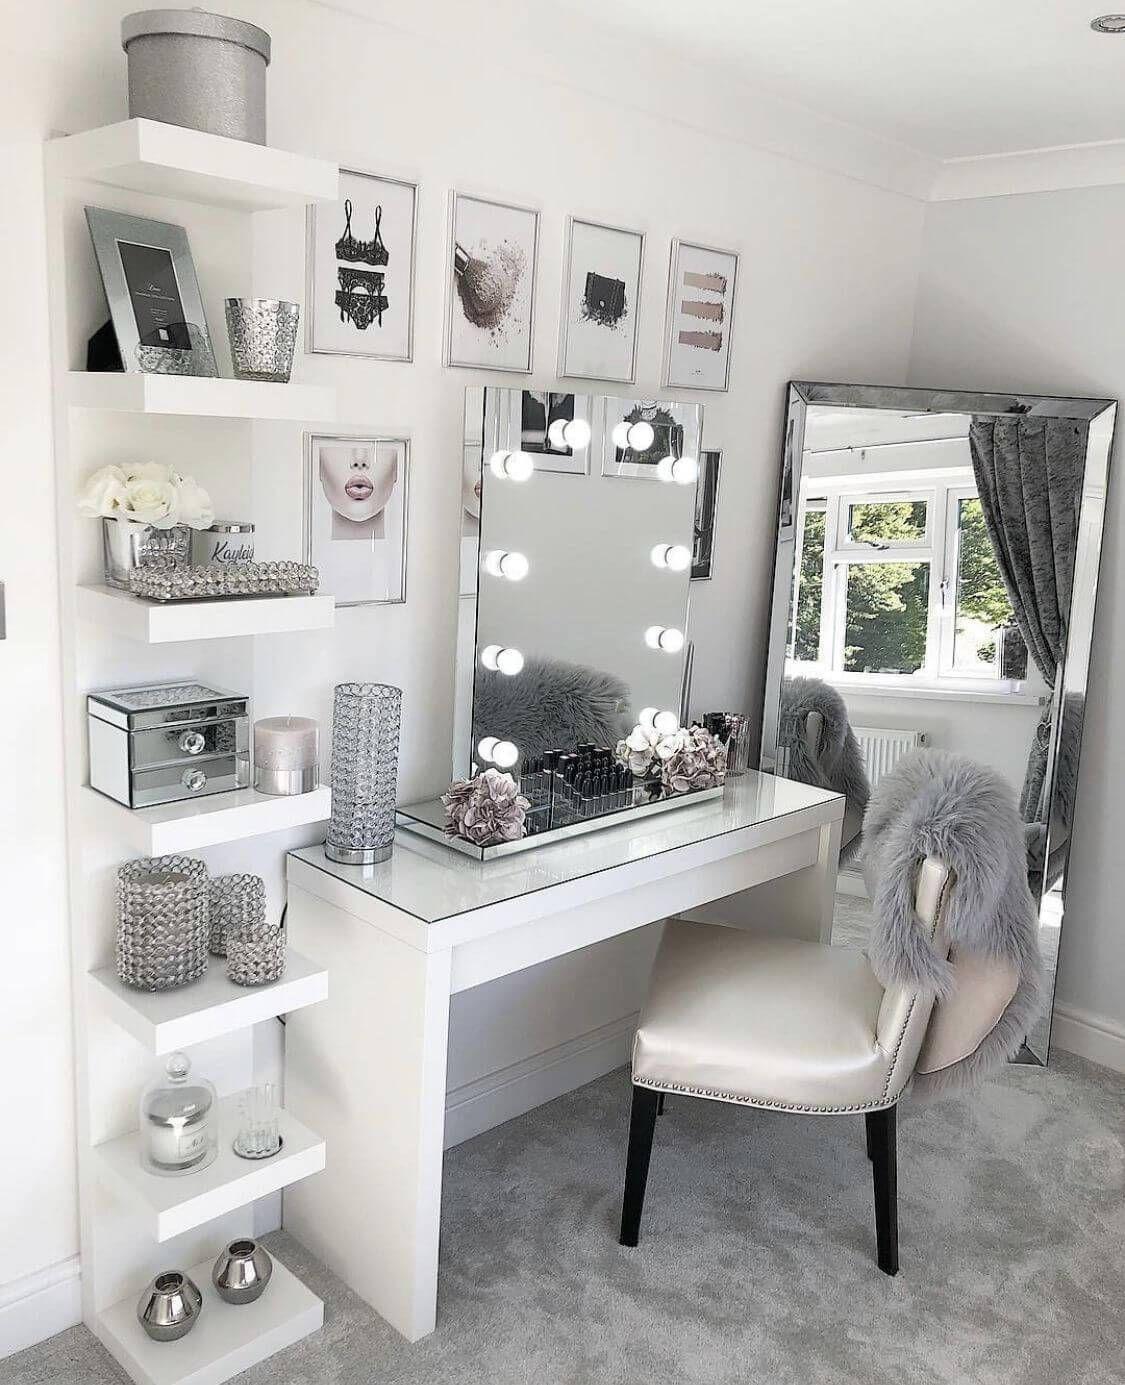 Breathtaking makeup room ideas diy #makeuproomideas